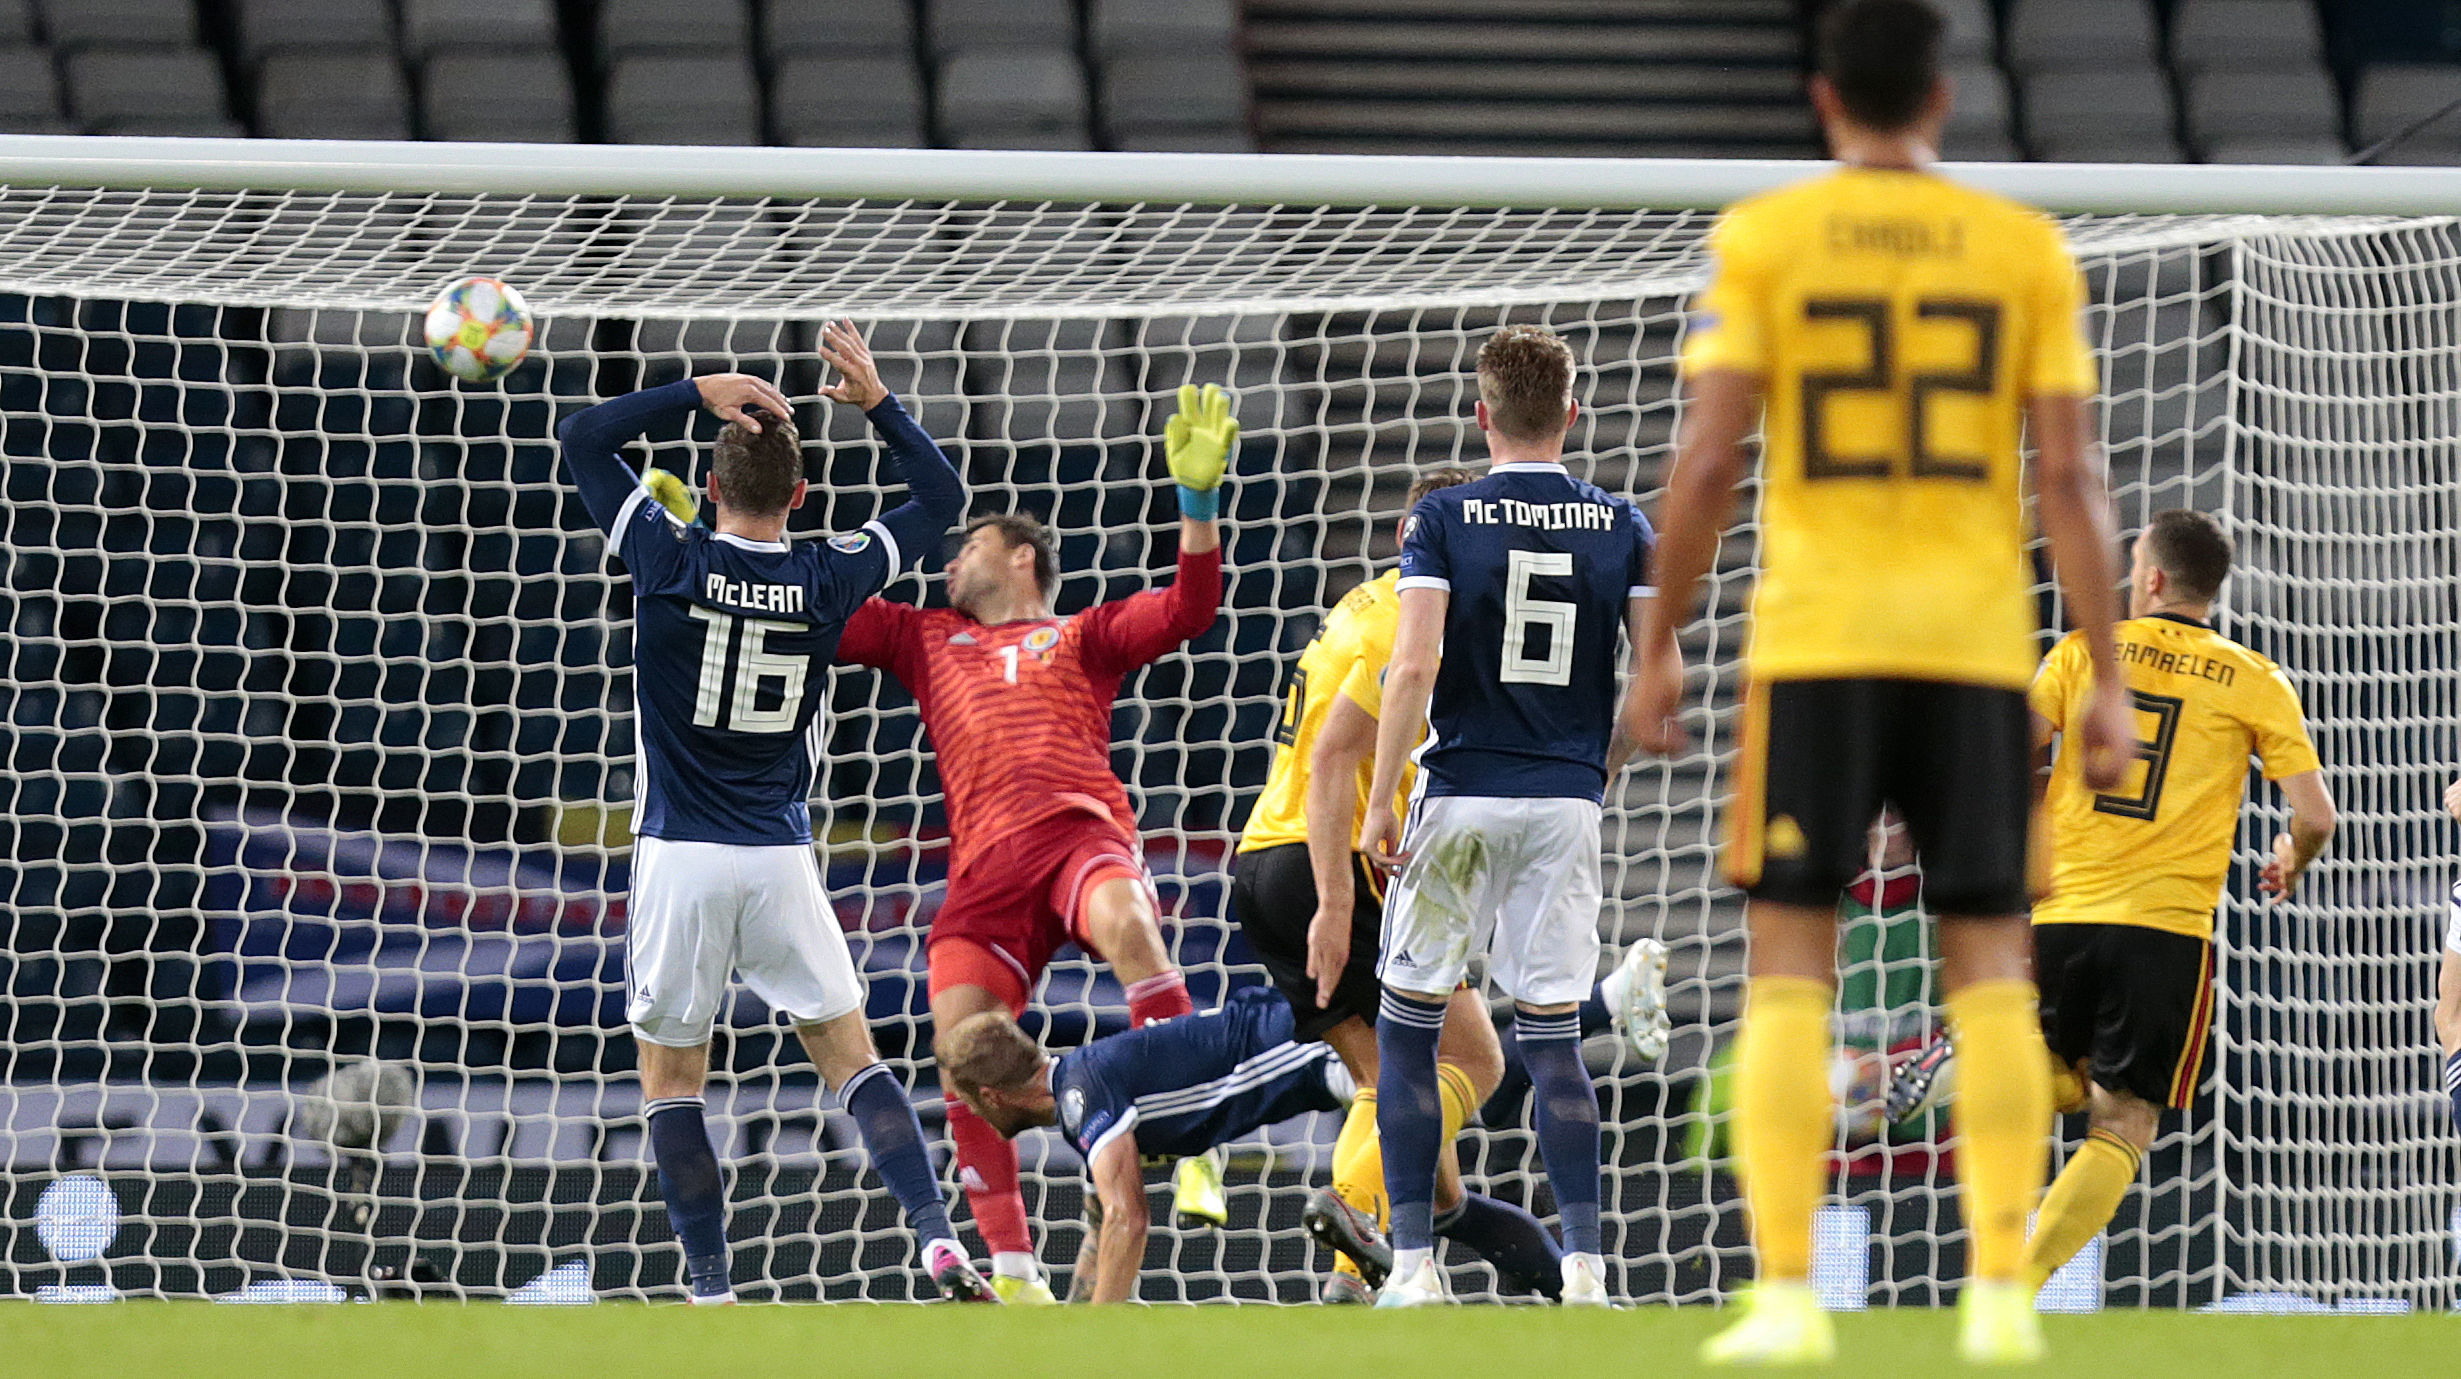 Thomas Vermaelen (No 3) scores Belgium's second goal.